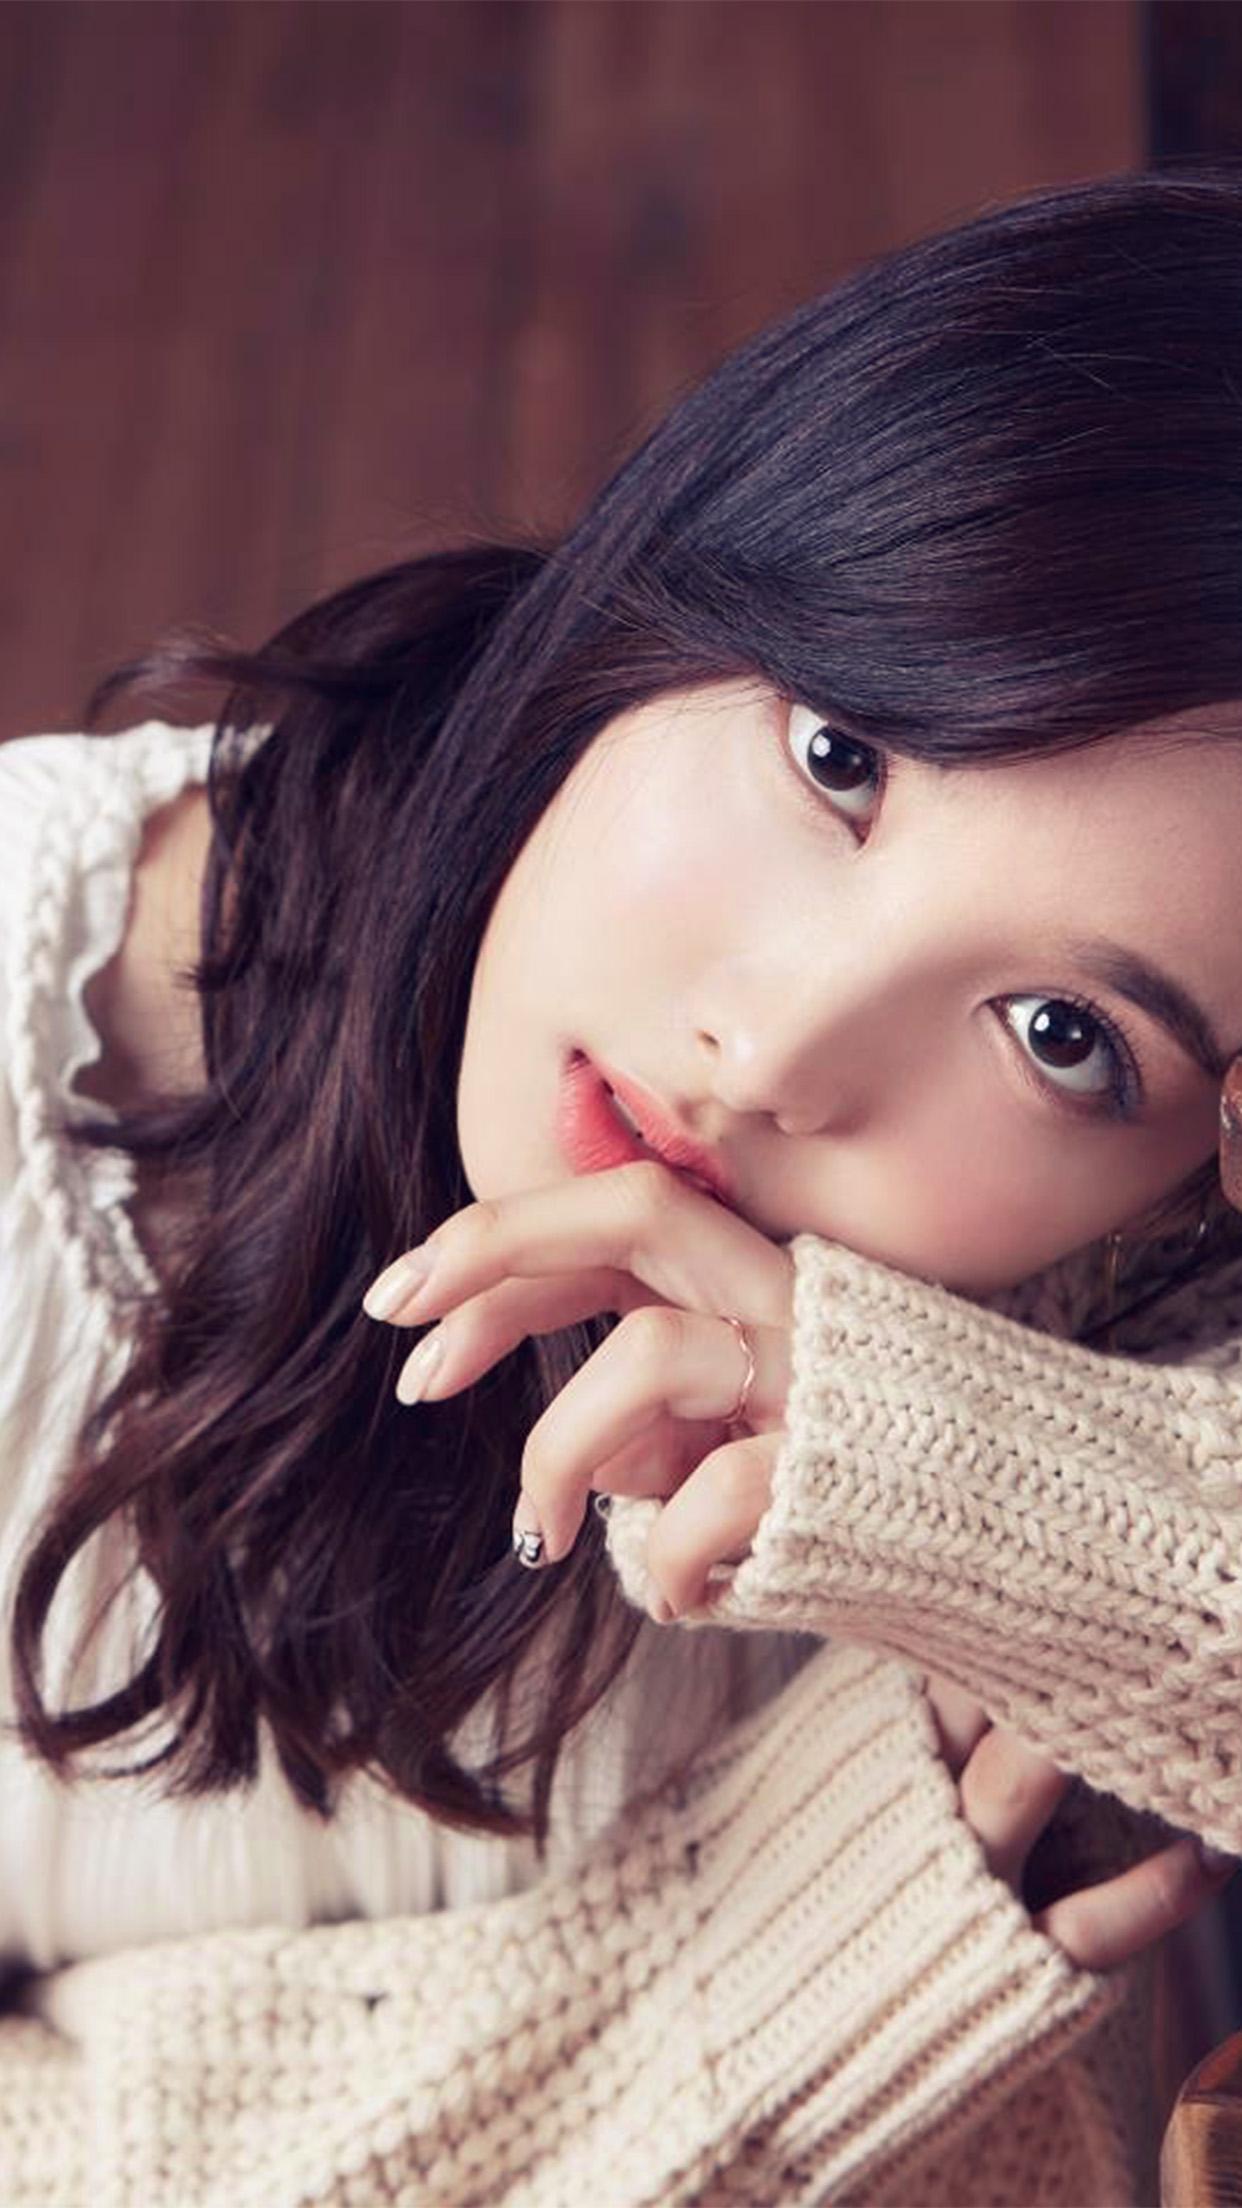 Girl Wallpaper For Iphone 6 Plus Hp22 Kpop Asian Girl Wallpaper